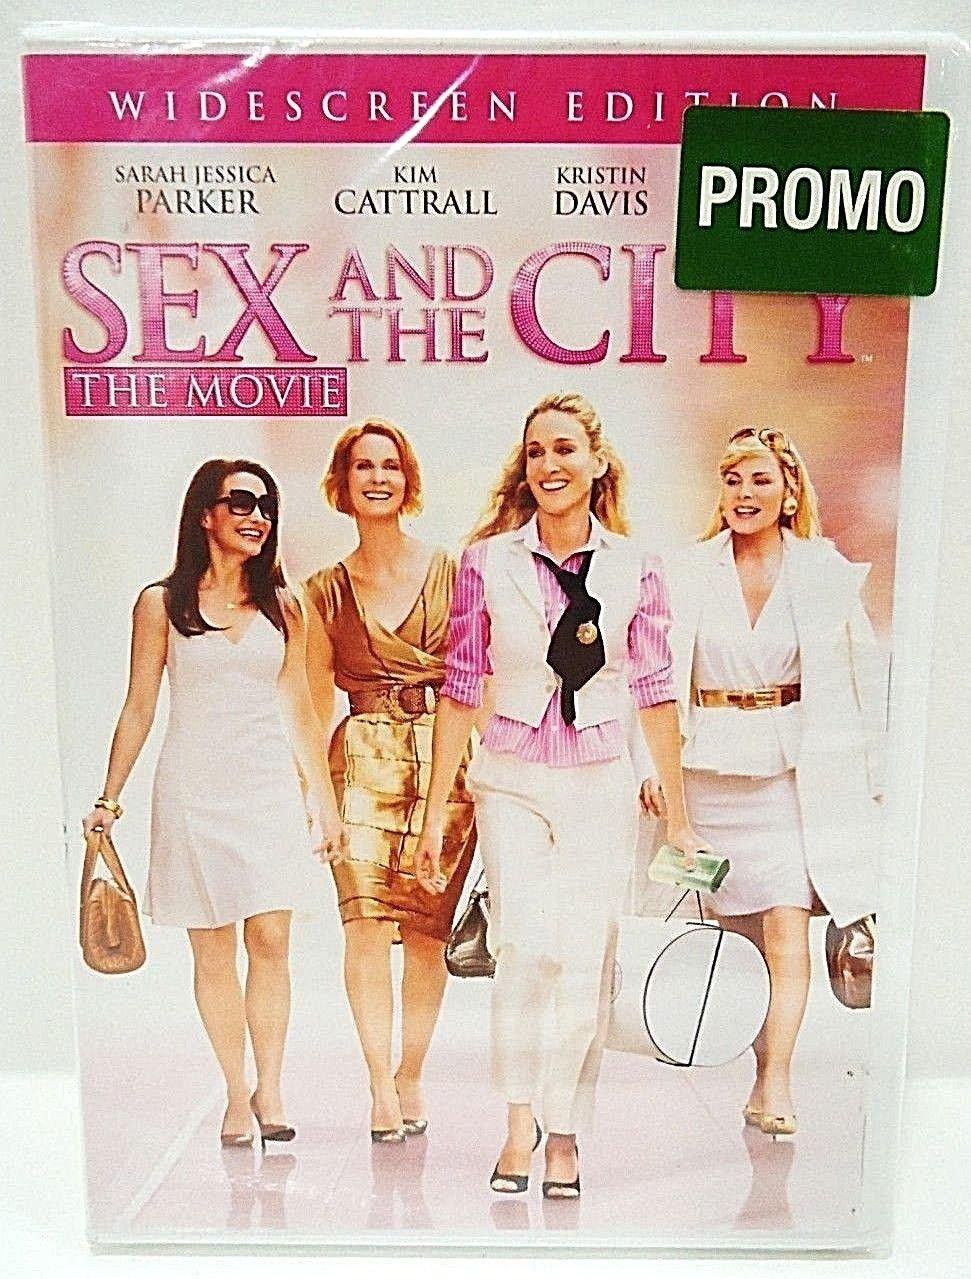 SEX AND THE CITY - THE MOVIE - DVD - SARAH JESSICA PARKER - NEW - COMEDY - FILM